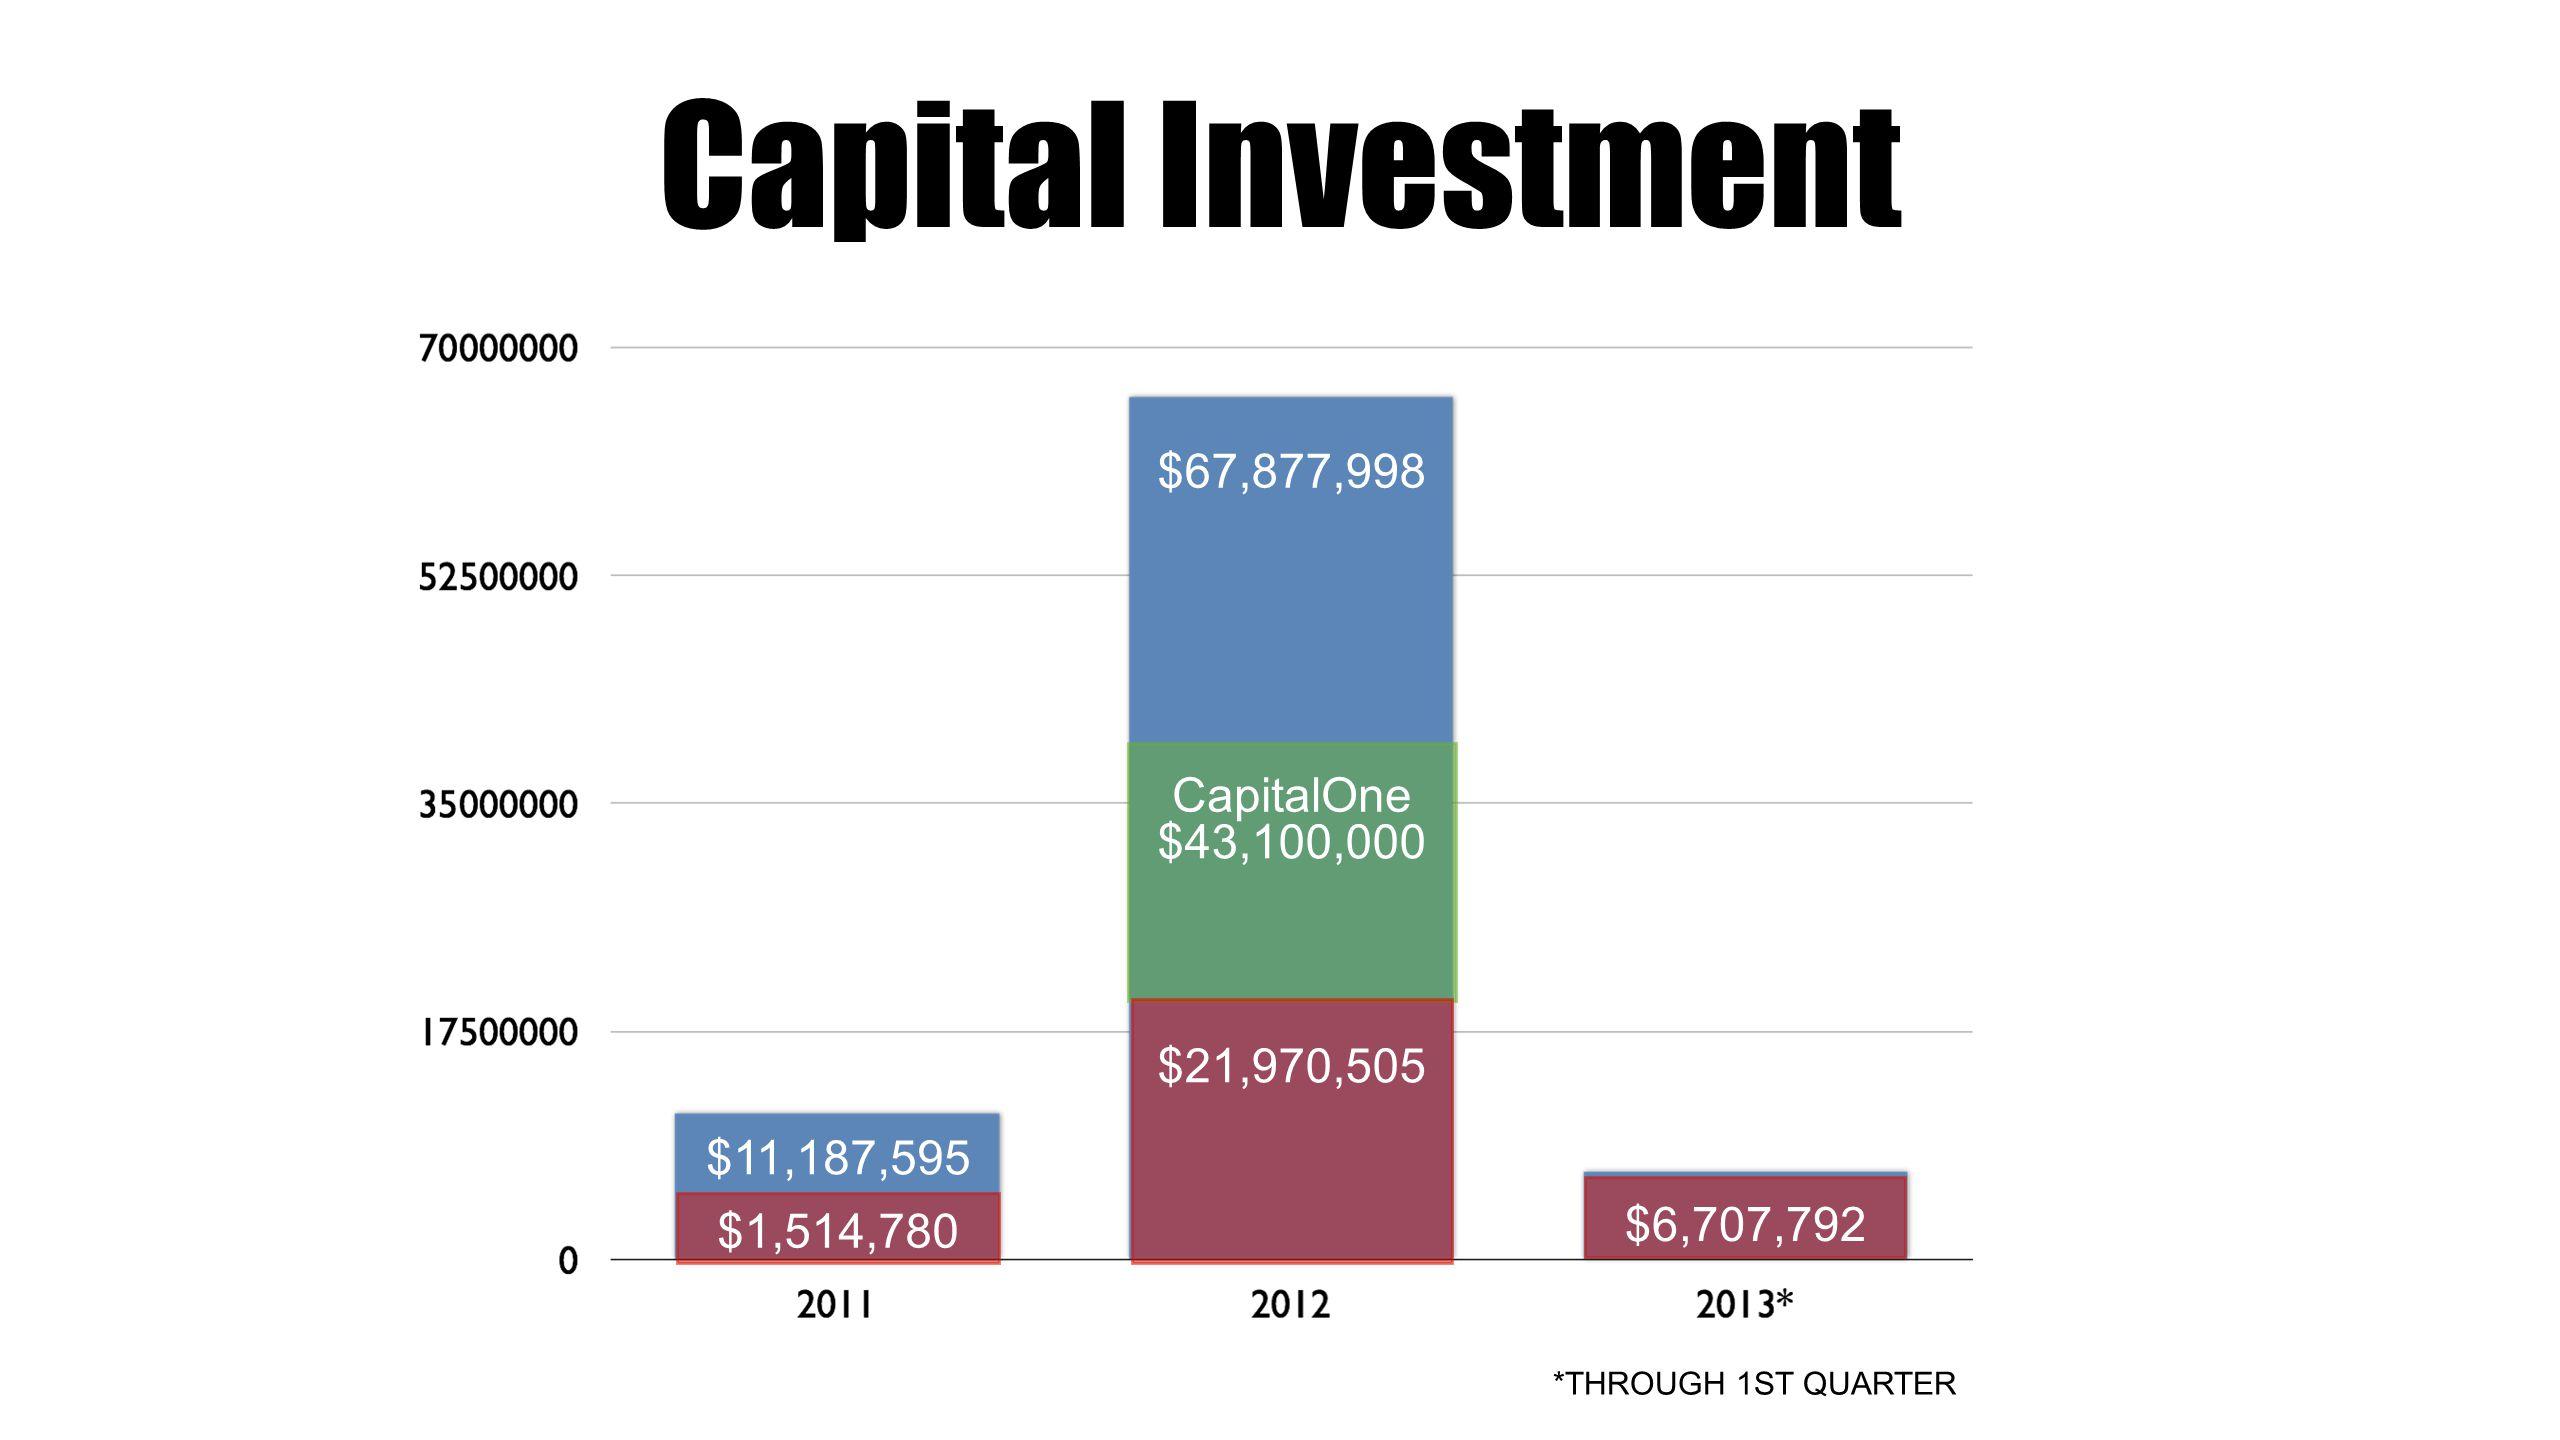 Capital Investment 56 6679 $67,877,998 *THROUGH 1ST QUARTER $43,100,000 CapitalOne $11,187,595 $1,514,780 $6,707,792 $21,970,505 $67,877,998